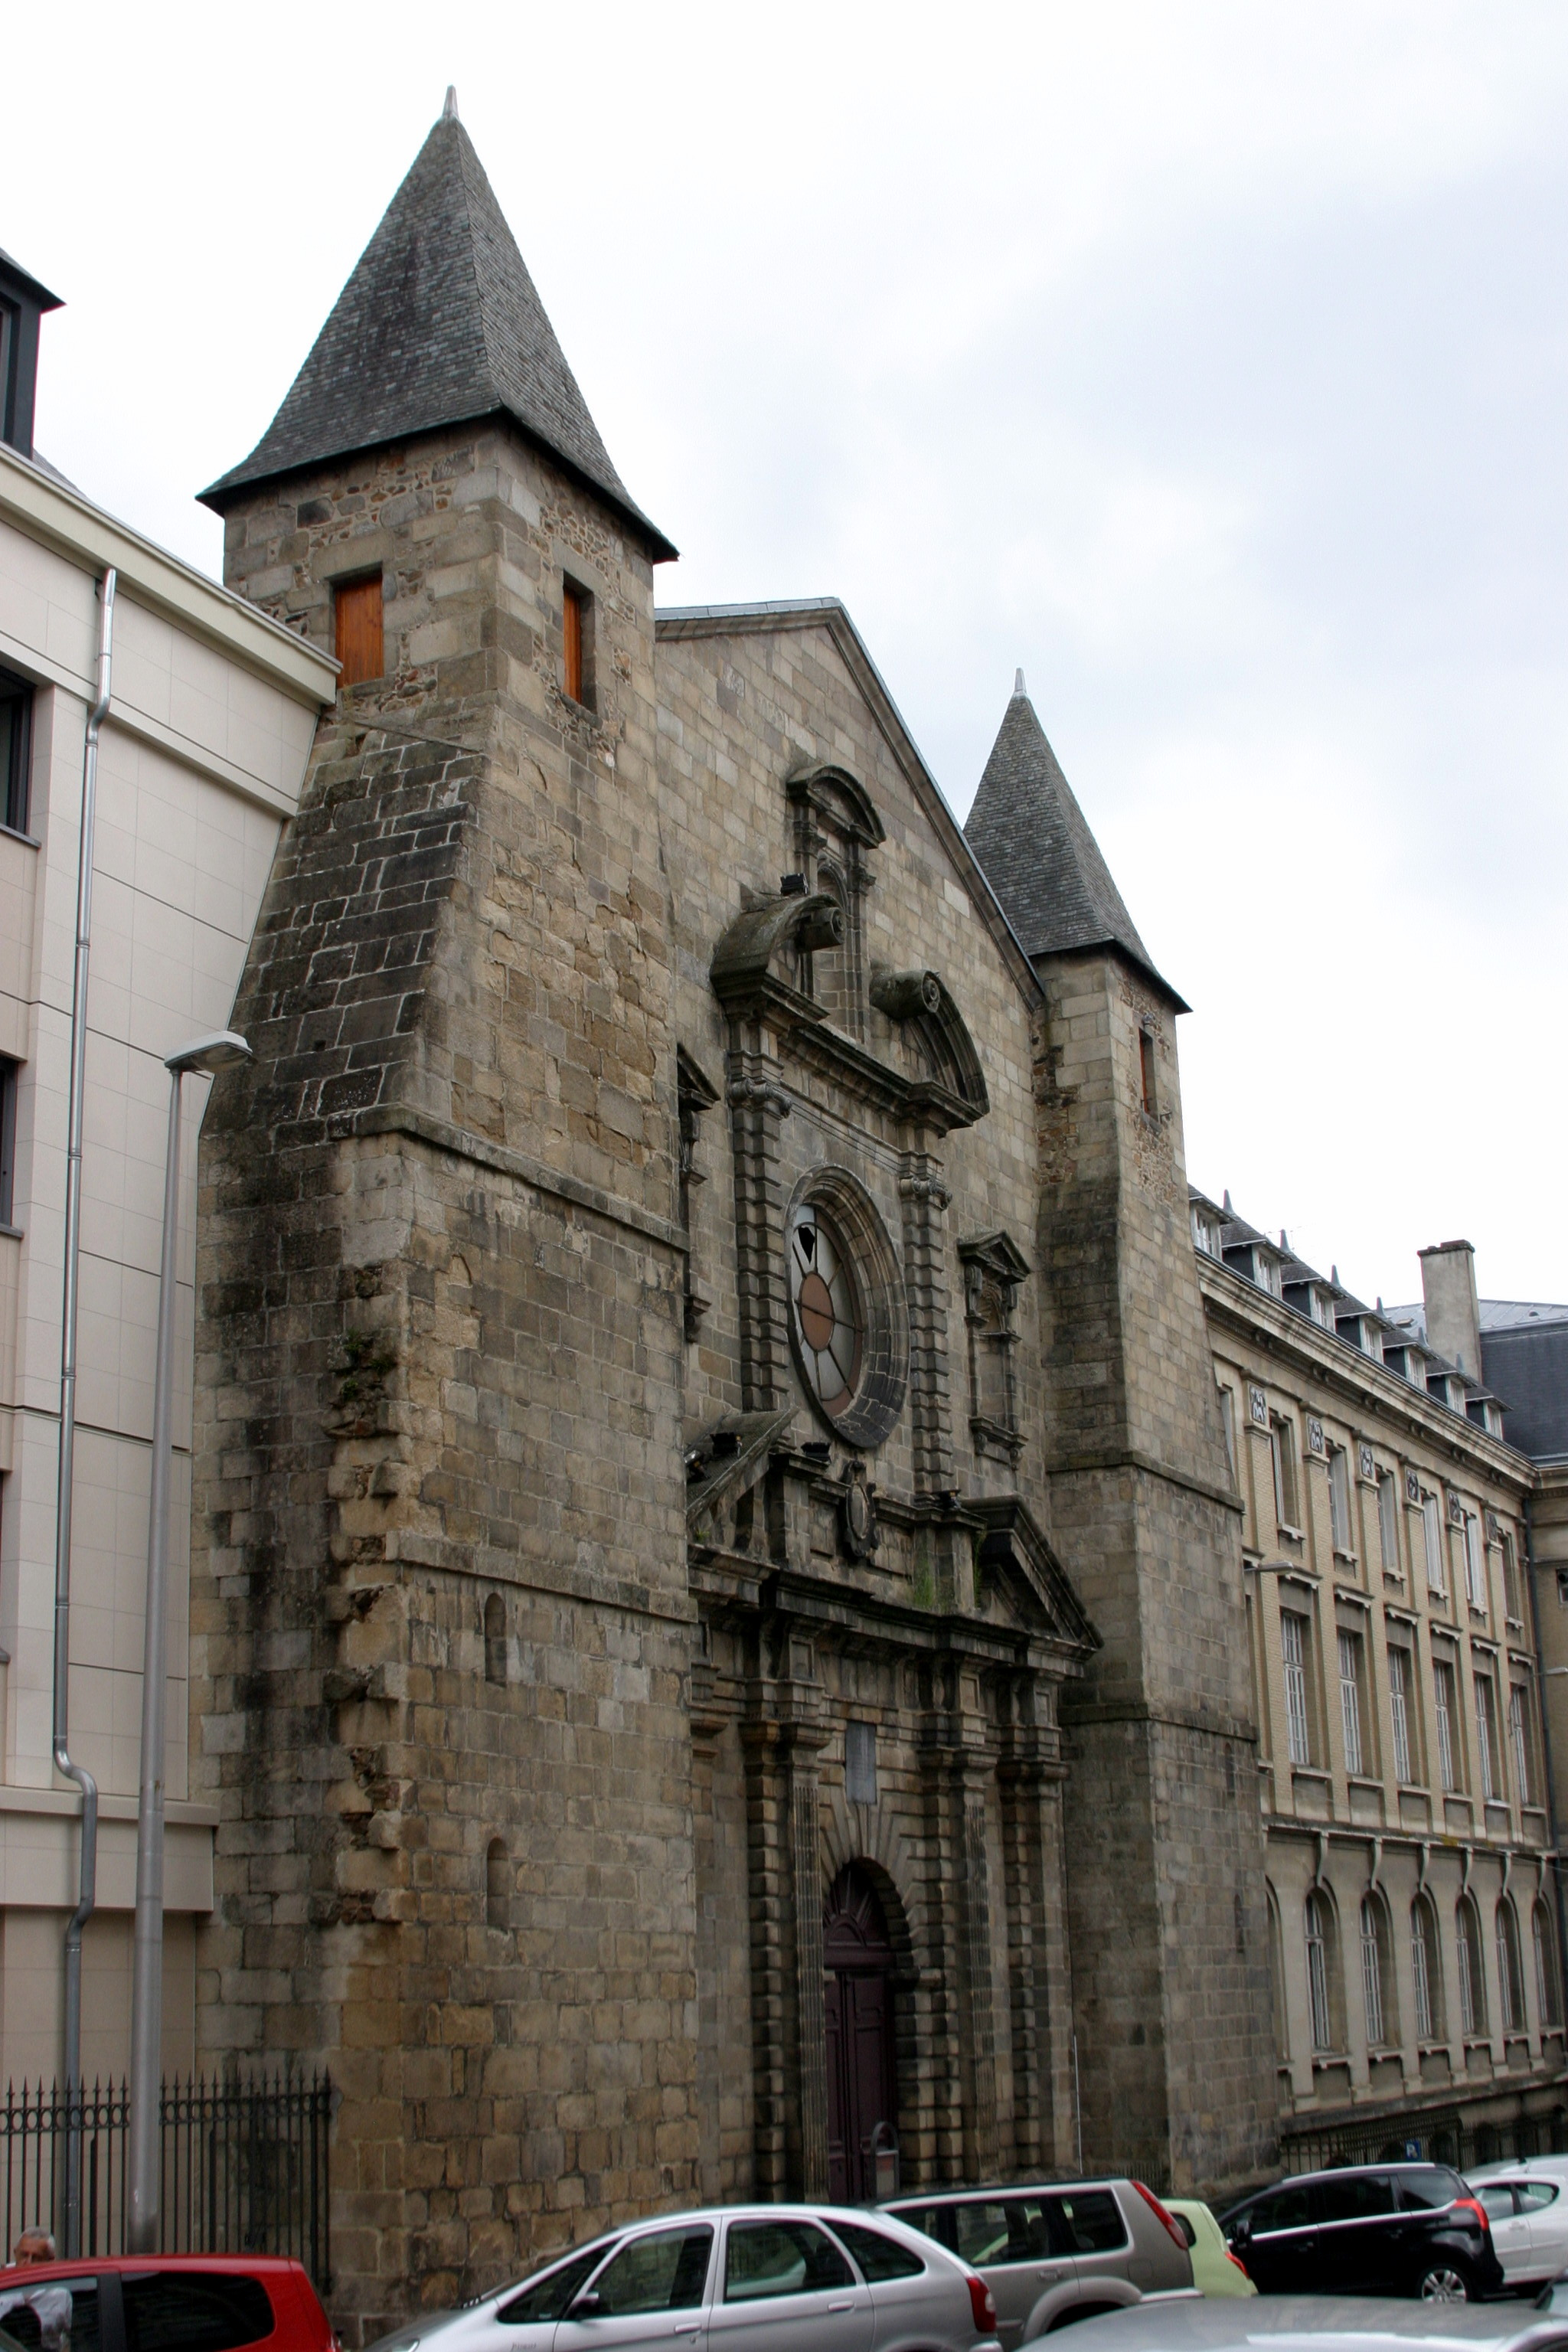 Limoges, France - Chapelle du College des Jesuites - Built 1629